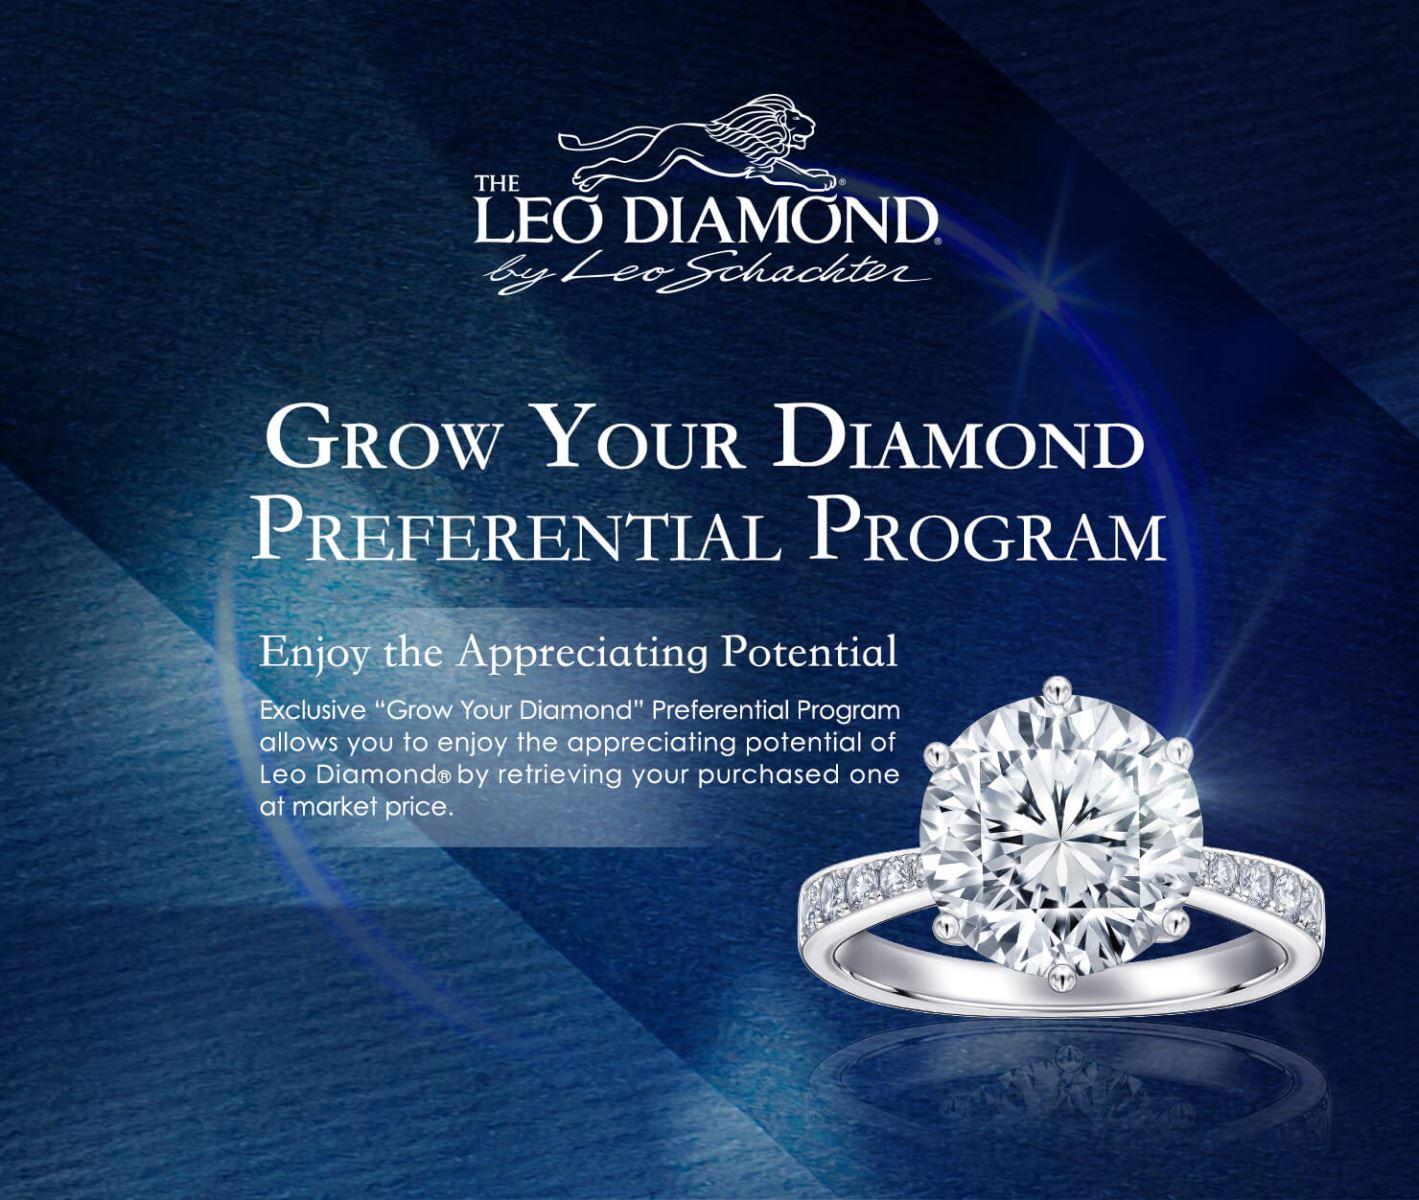 The Leo Diamond GYD-Enjoy the Appreciating Potential